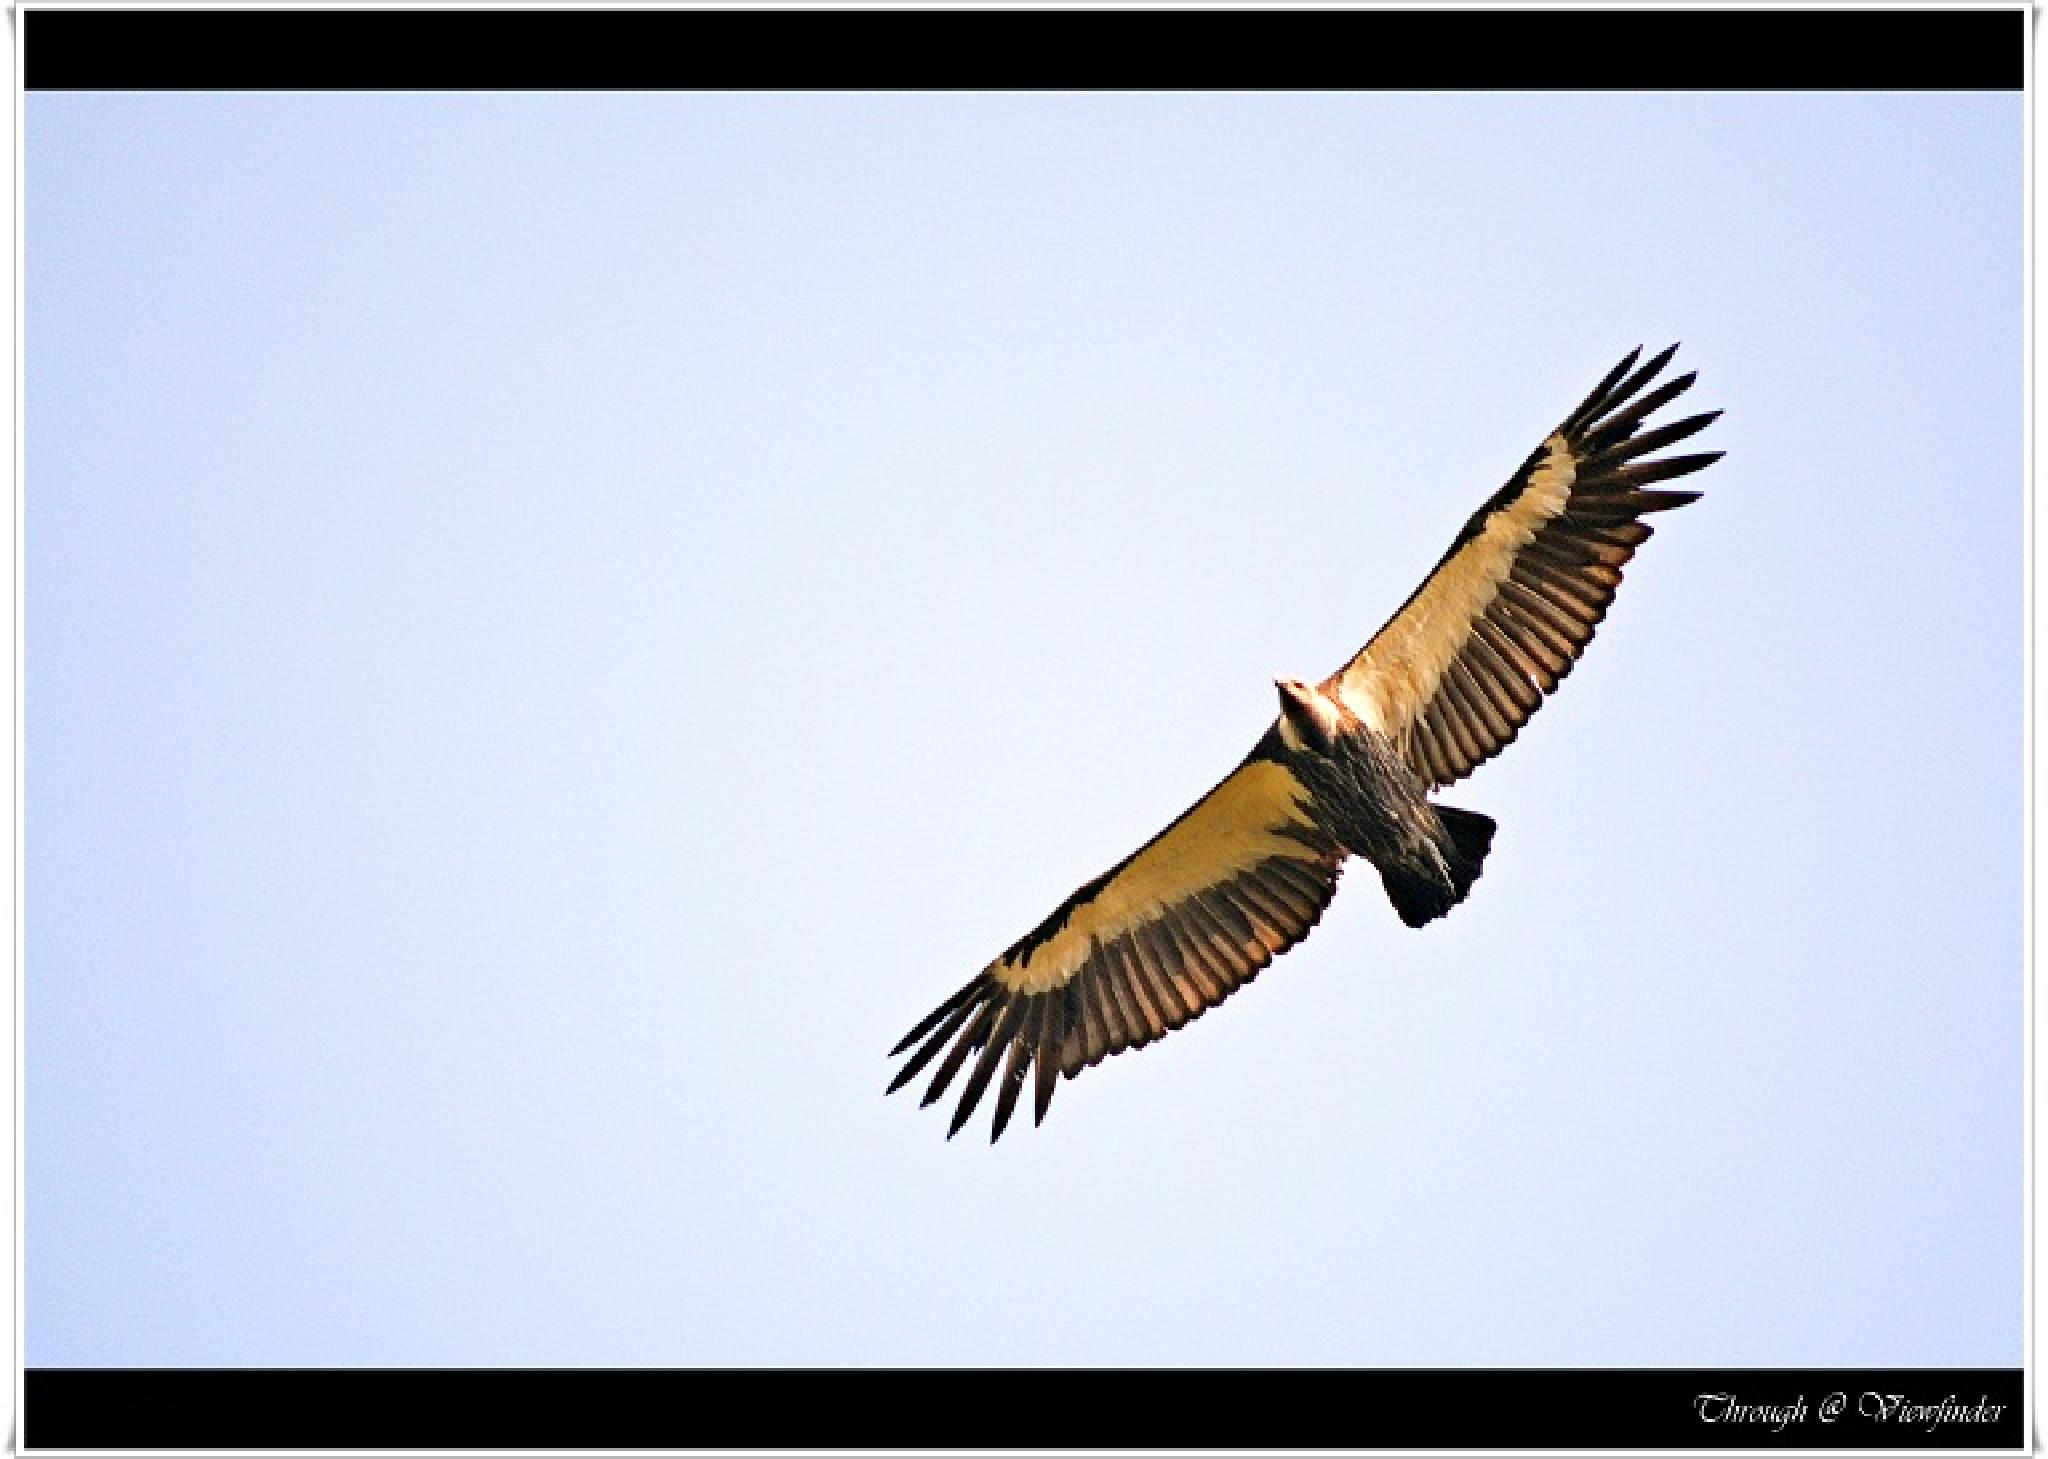 Vulture by prashobh.ailyam